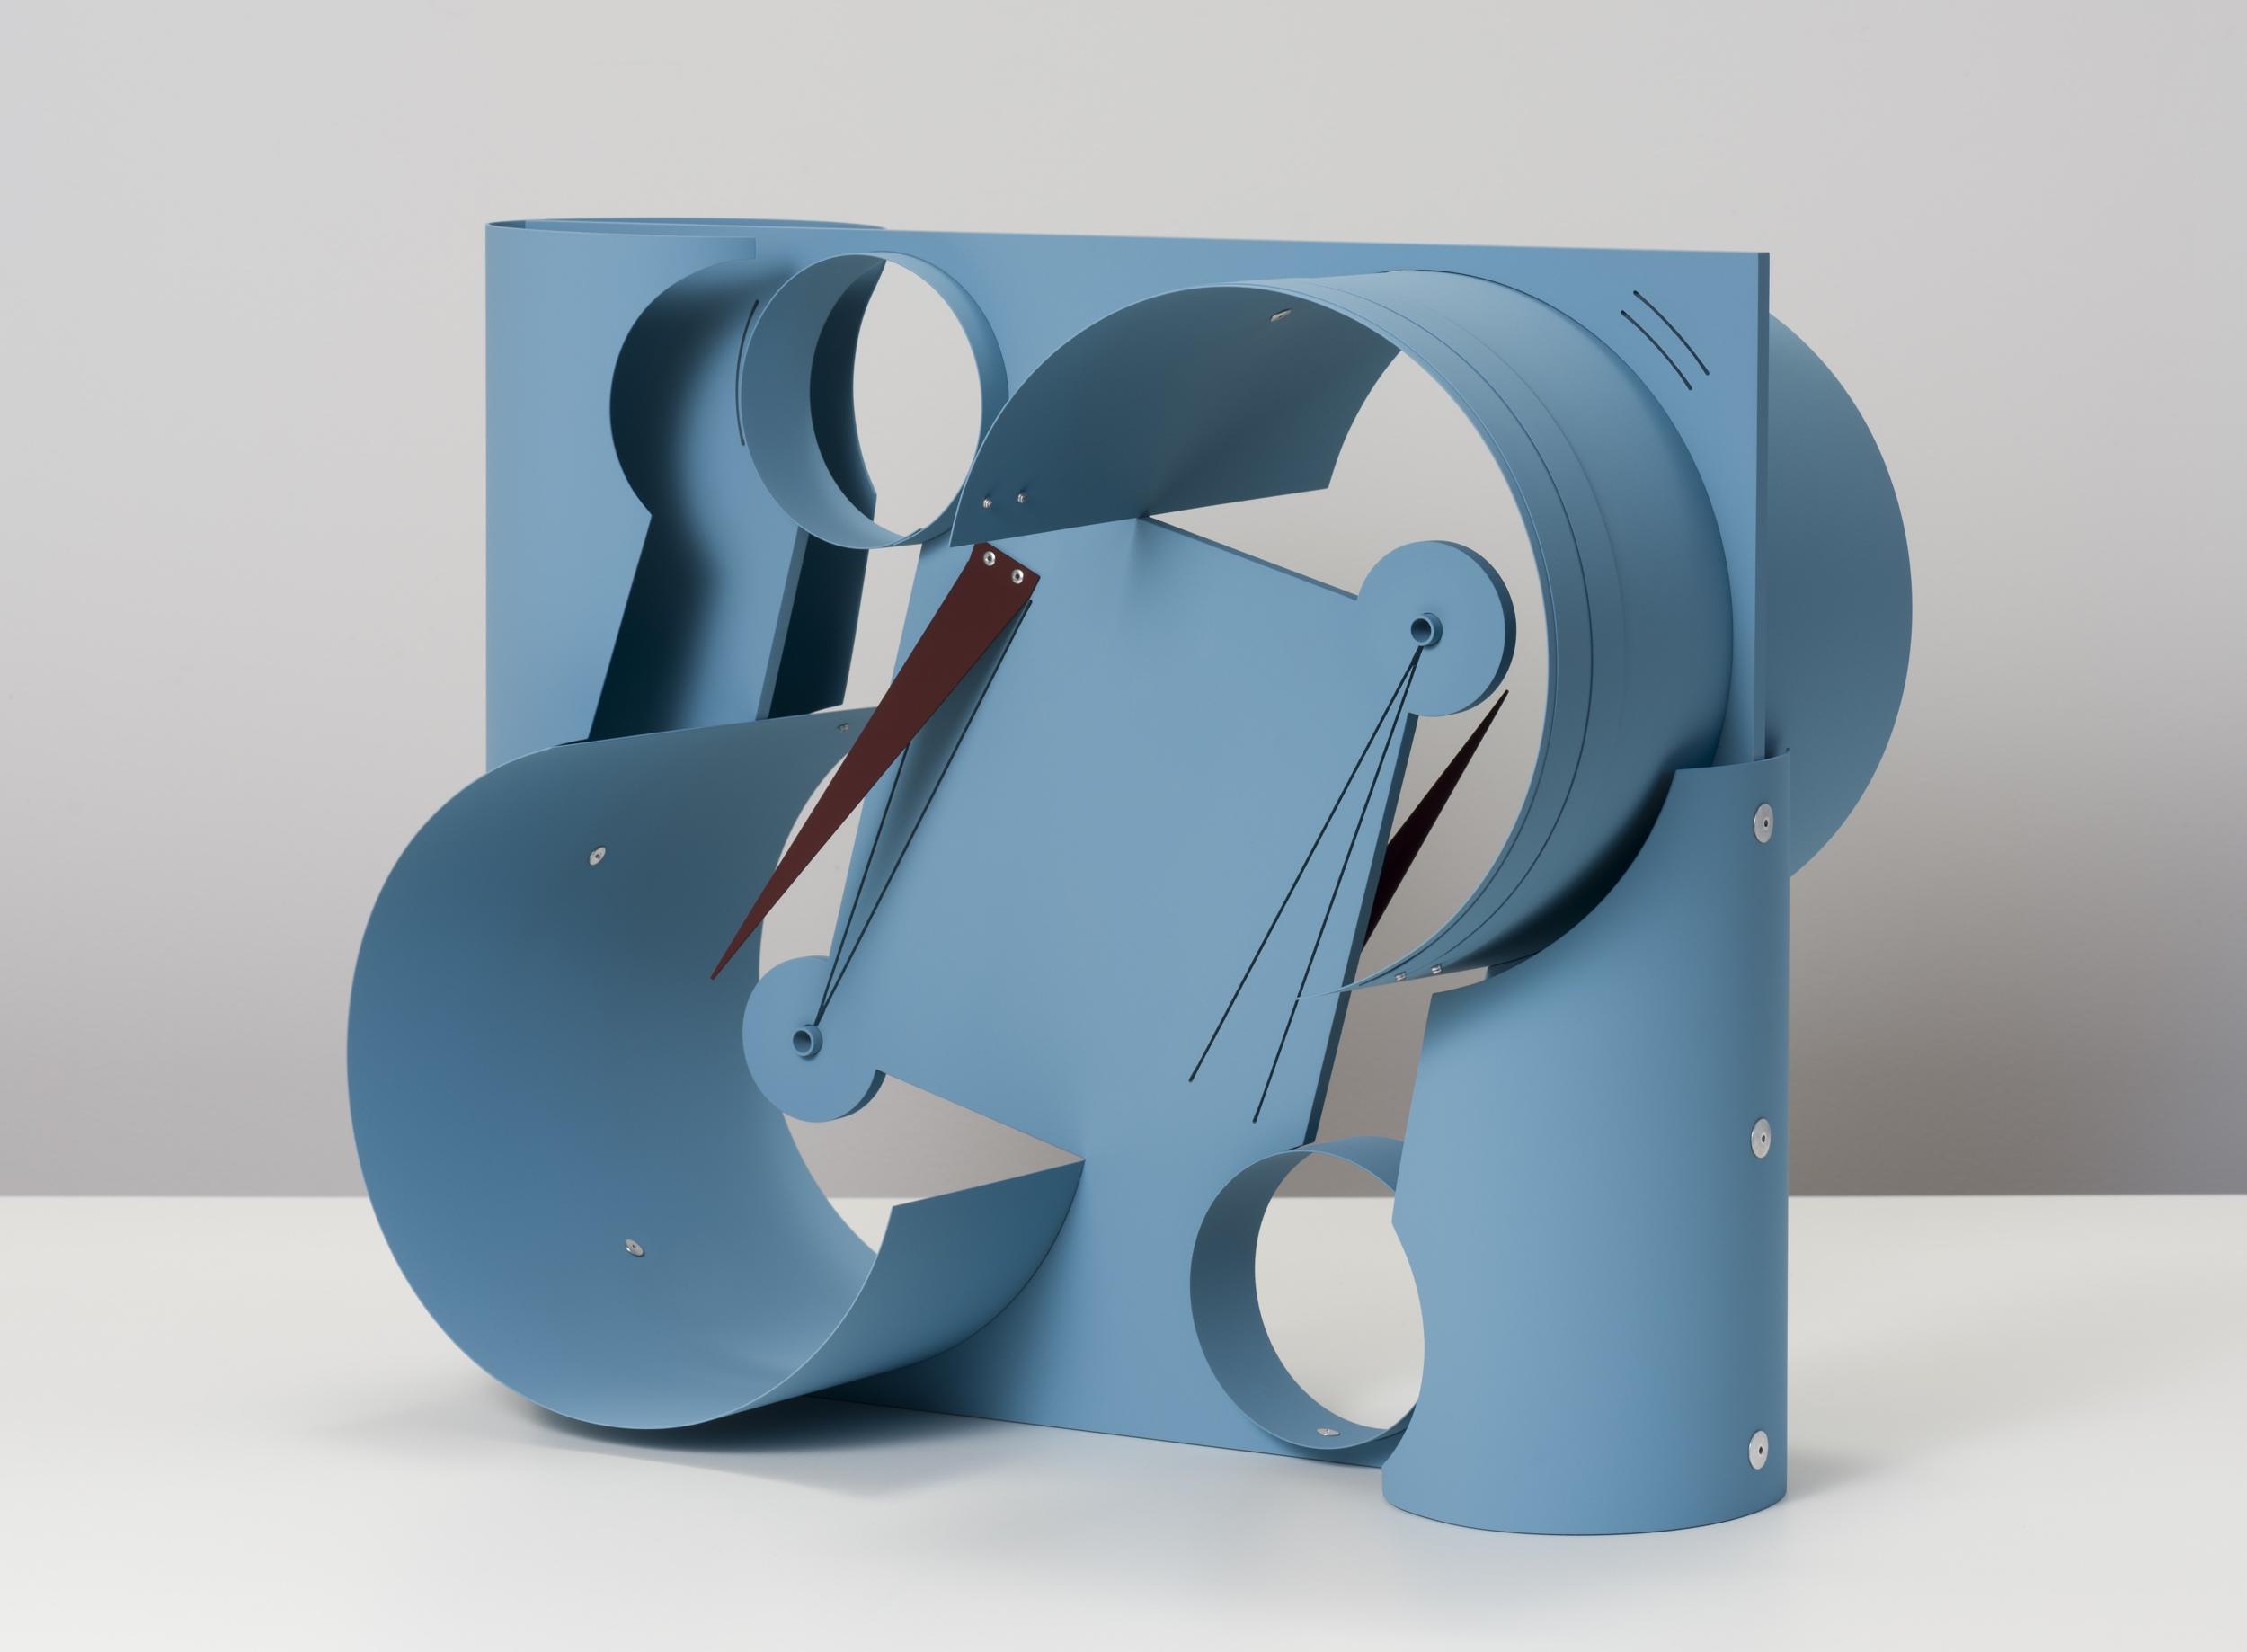 Matt Paweski, untitled (Machines - pale blue, maroon), 2018, aluminum, aluminum rivets, vinyl paint, 20 x 24 x 12 inches (50.8 x 60.9 x 30.5 cm)